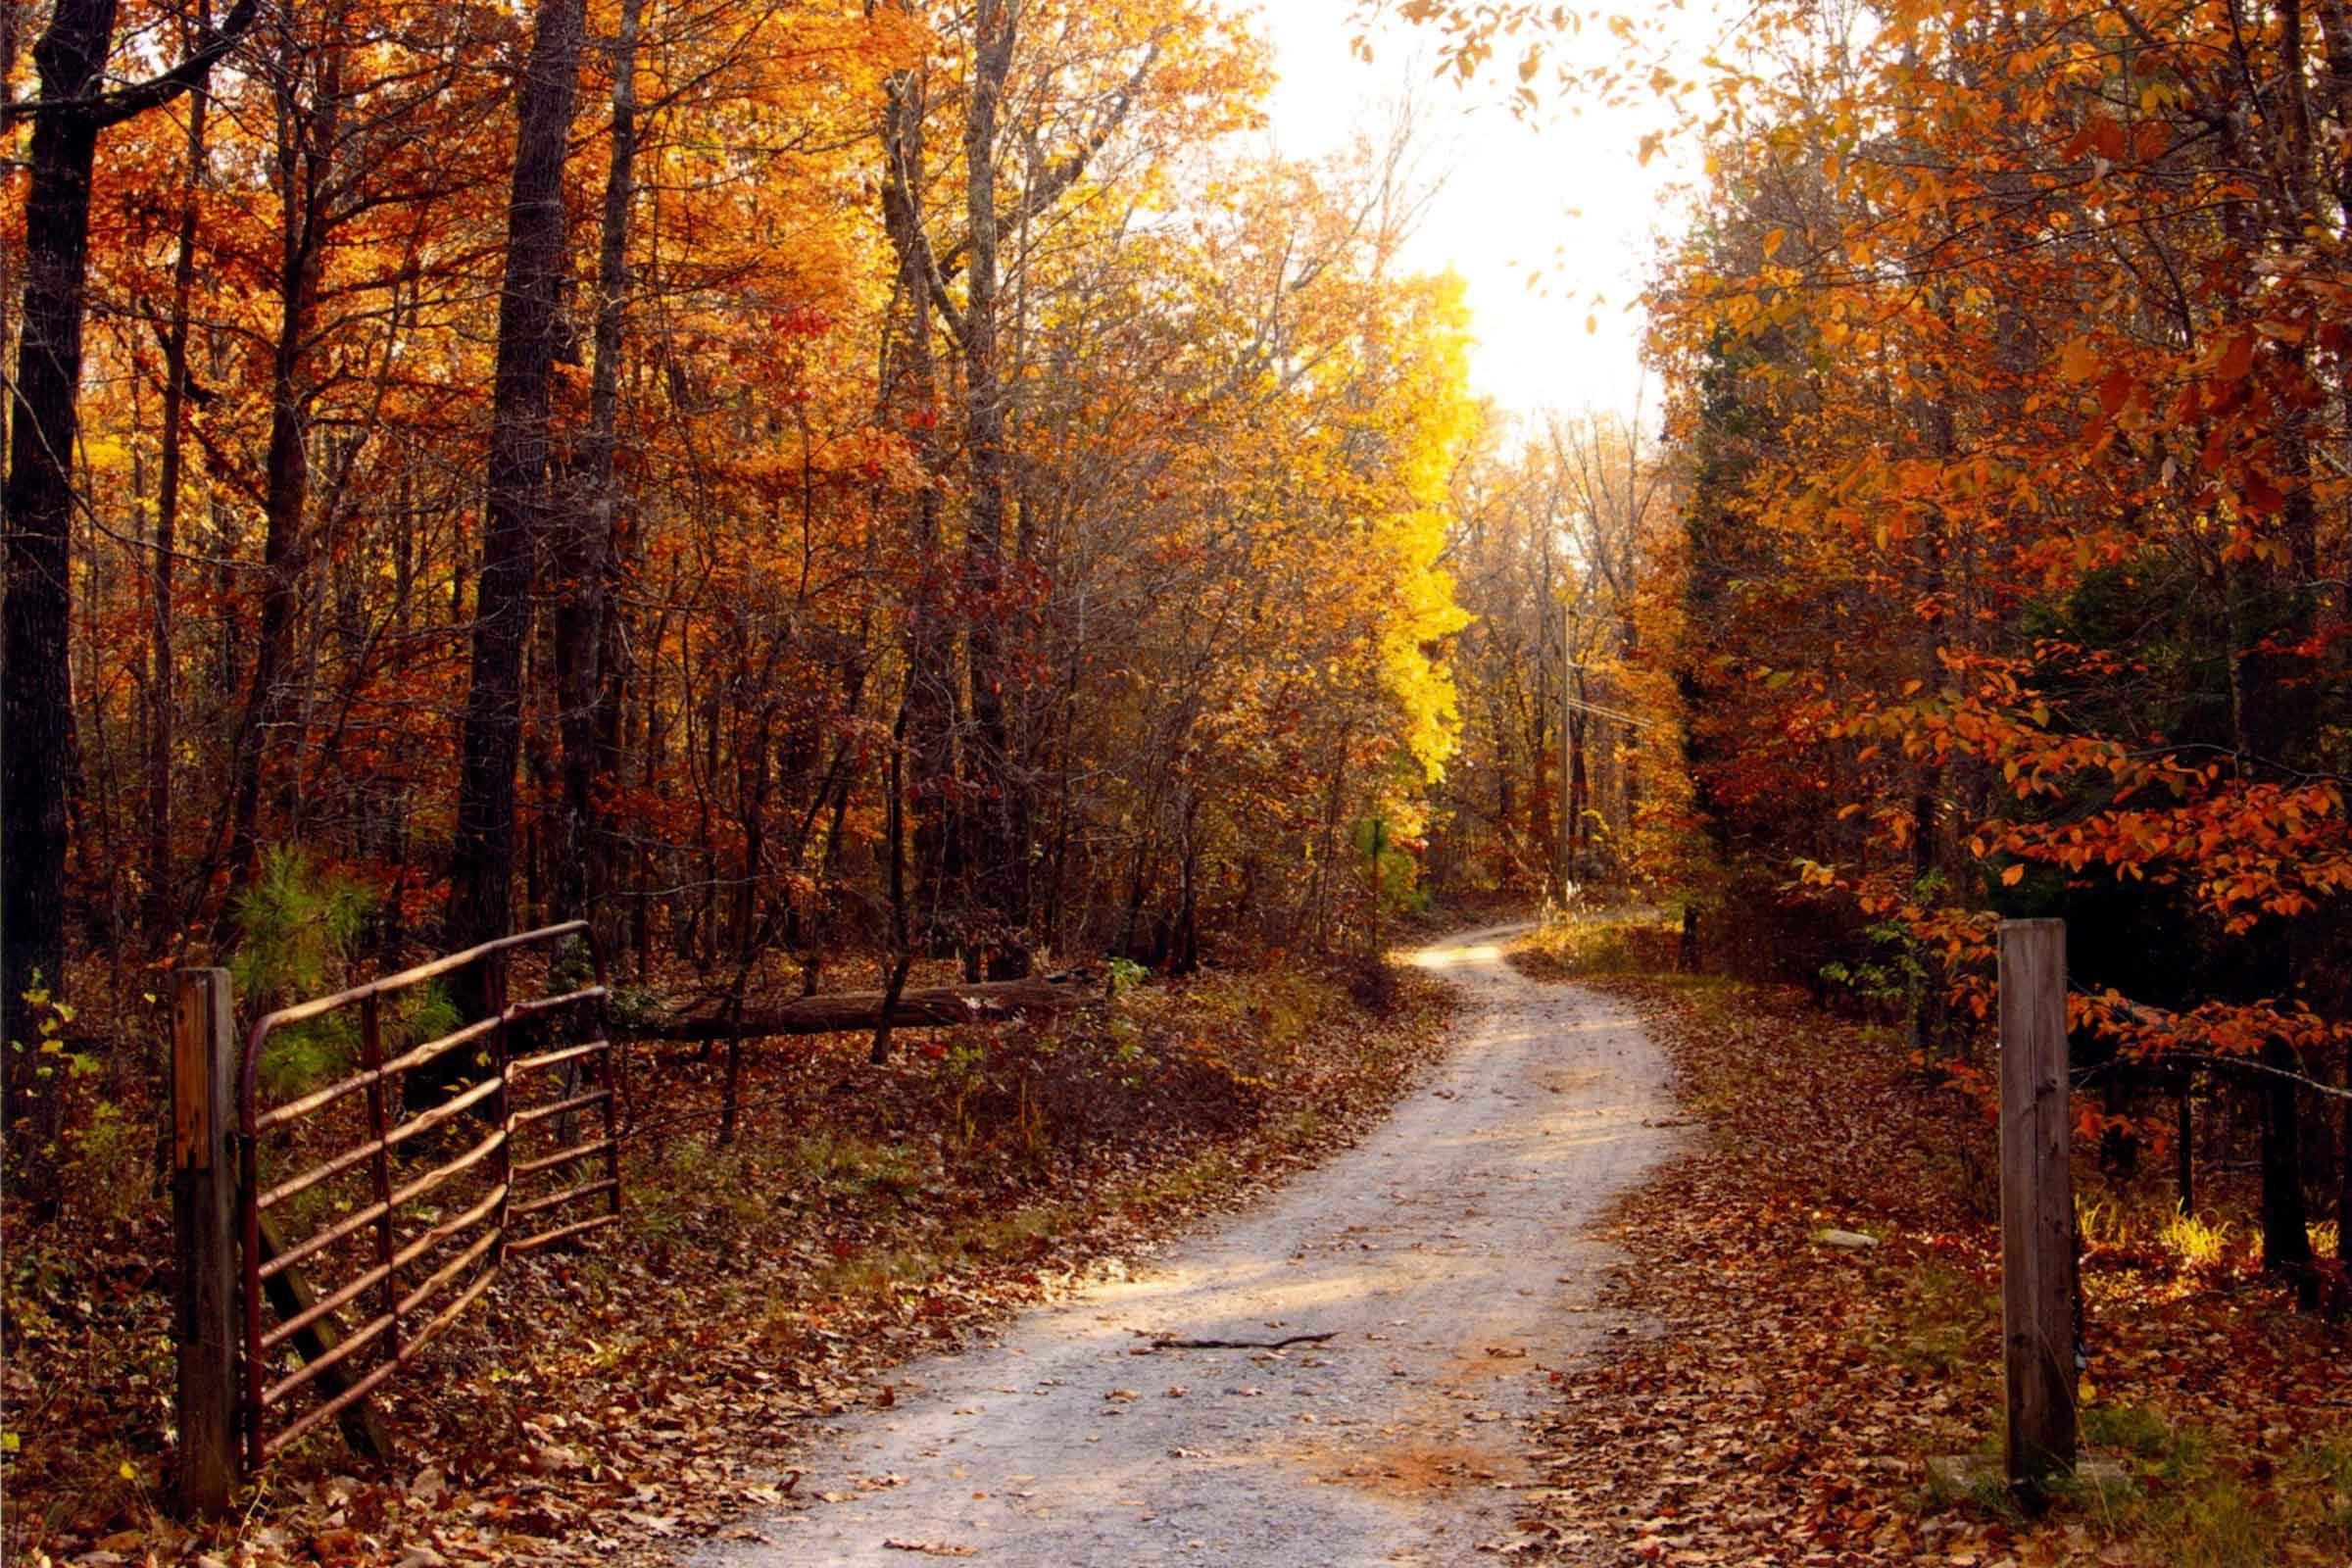 fall autumn america country waller alabama across stunning special pumpkin picking apple digest reader magazine